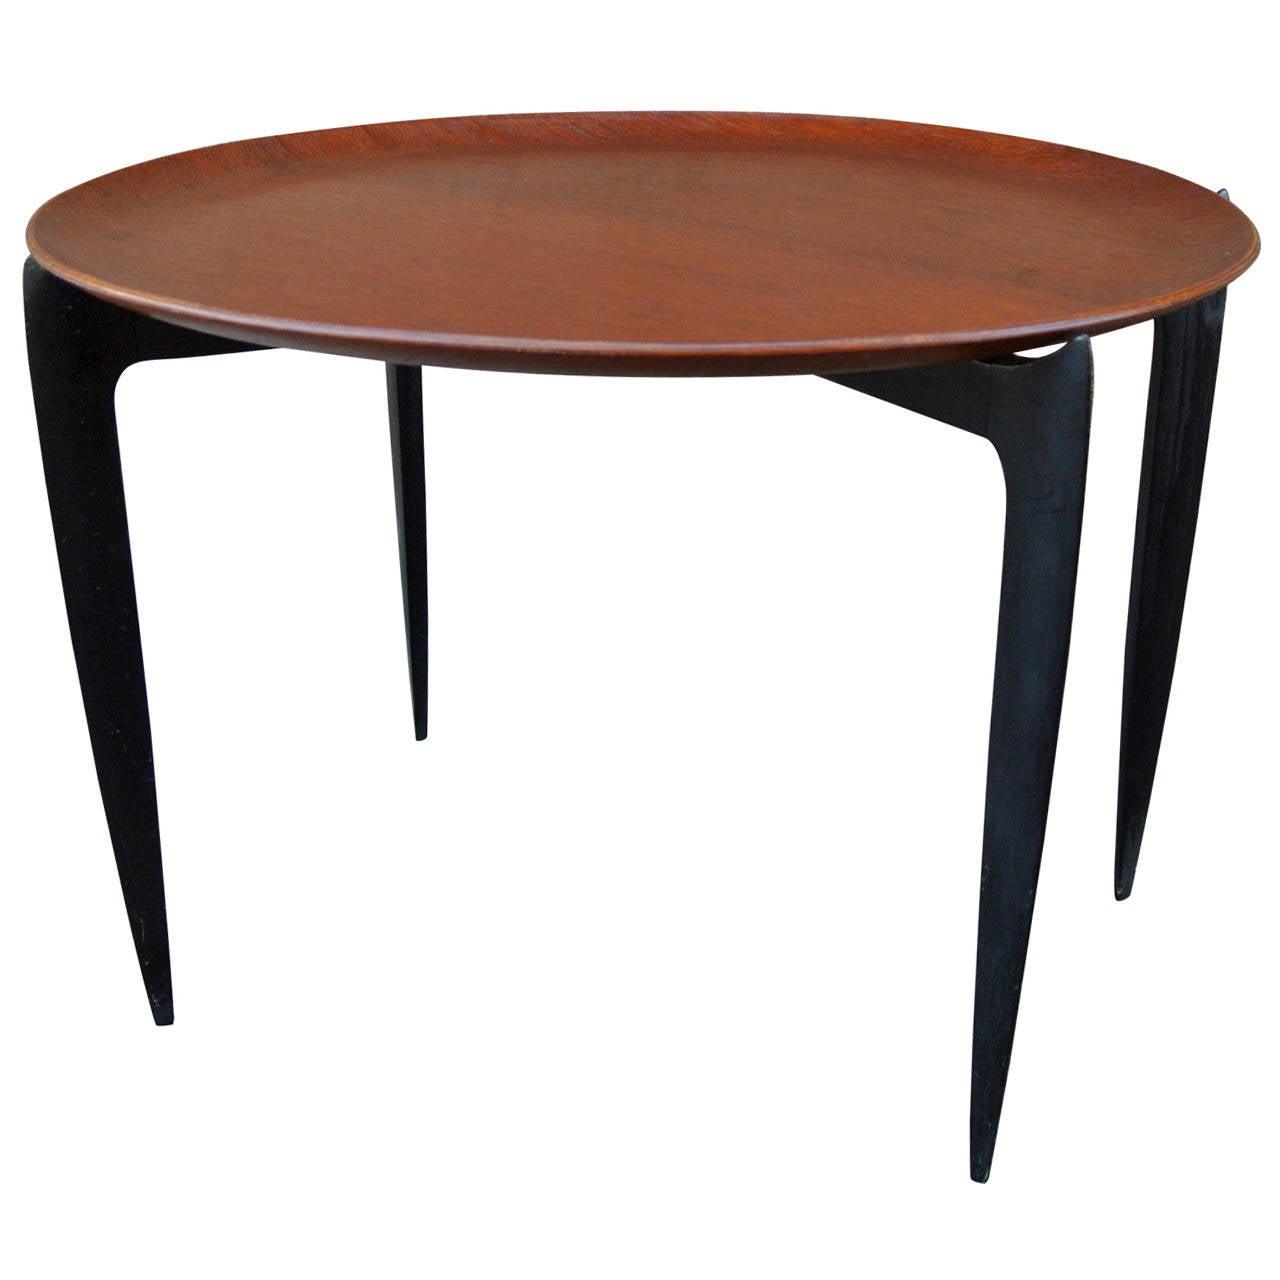 Circular Teak Tray Table by H. Engholm & Svend Willumsen for Fritz Hansen